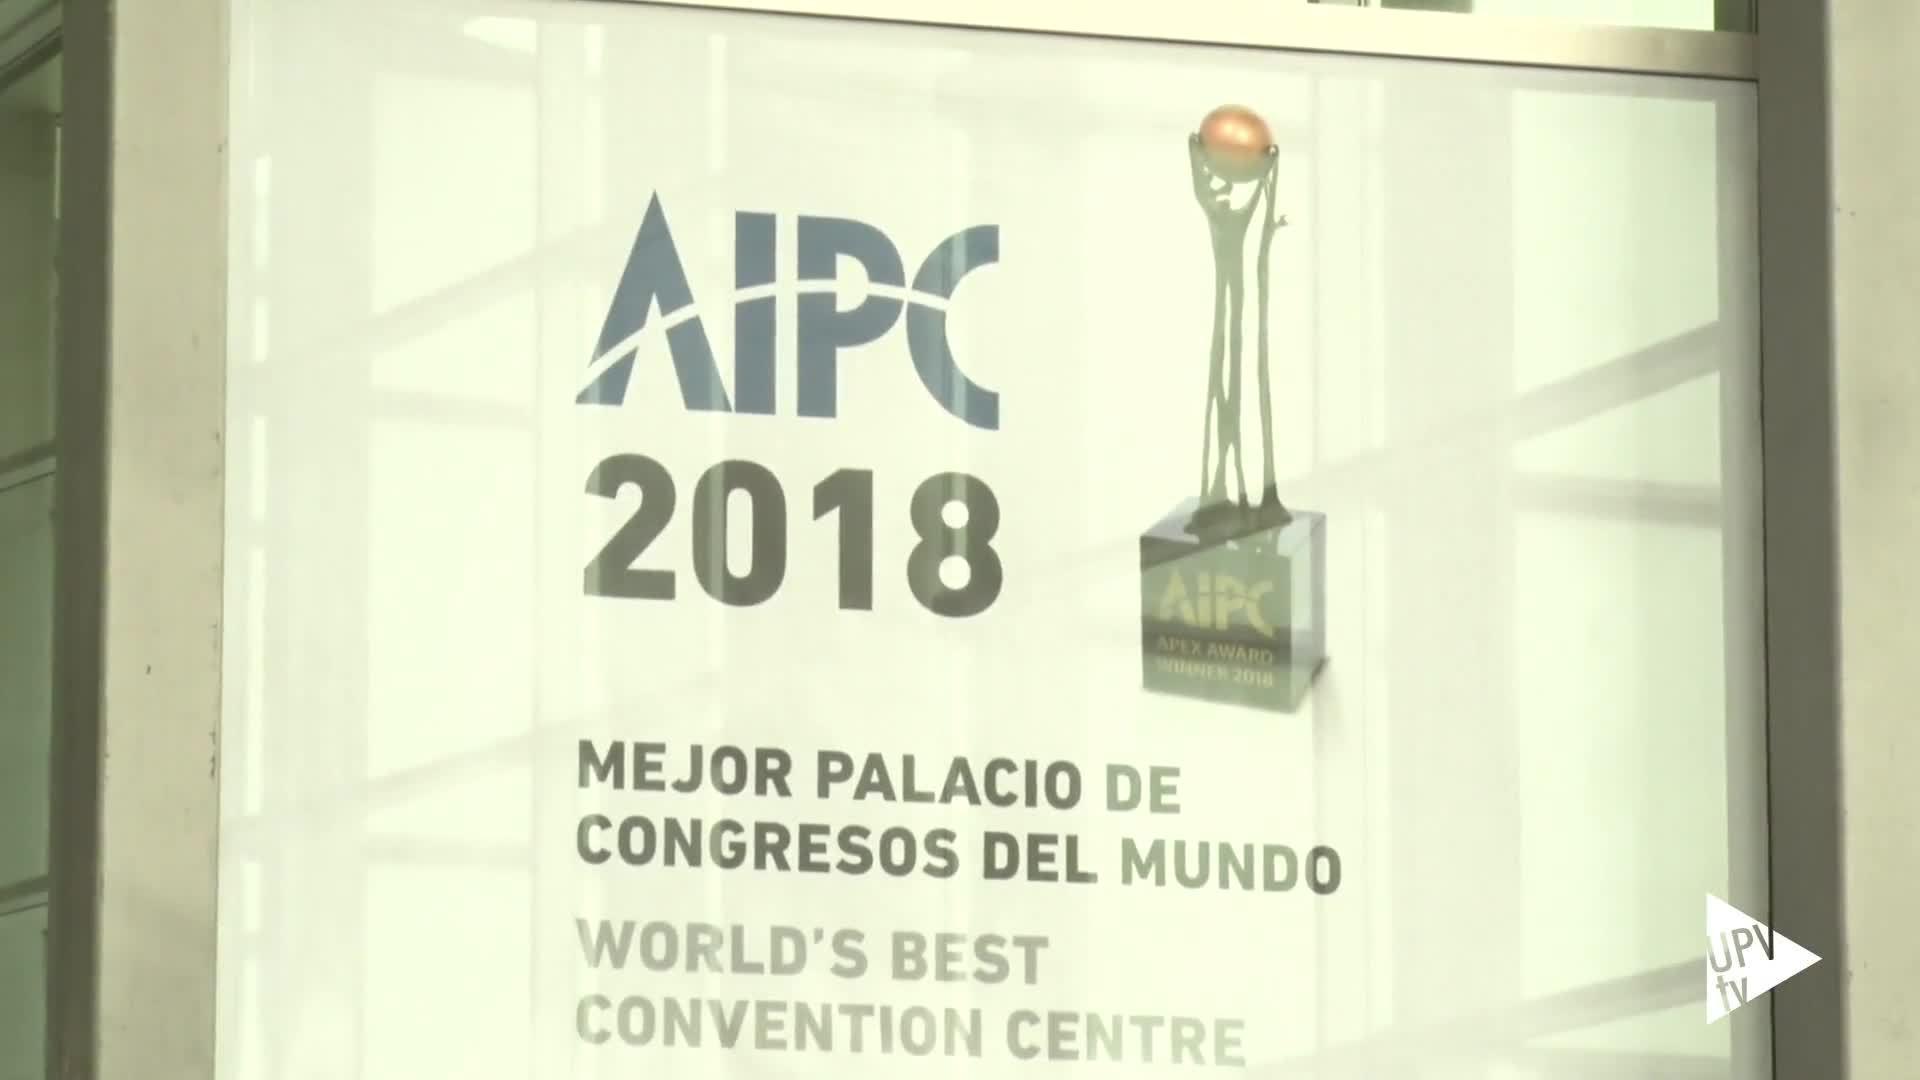 09-05-2019 València, capital mundial de 5G